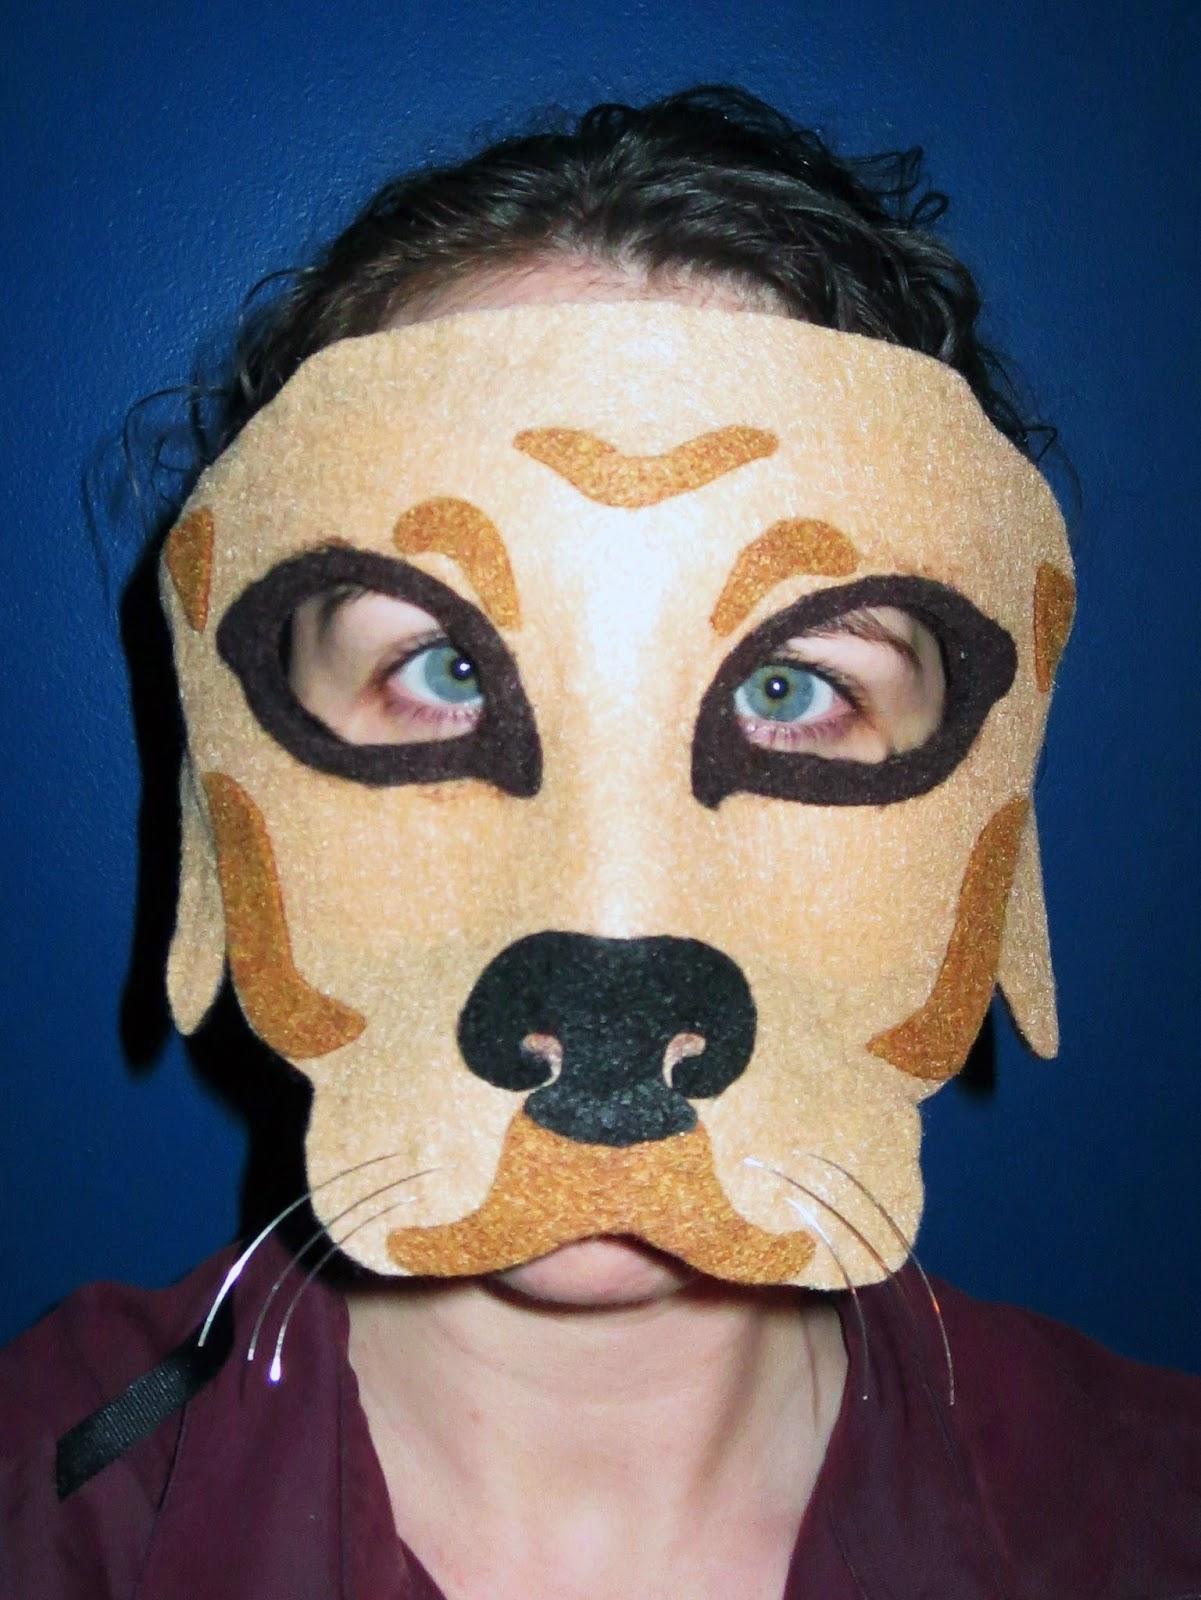 DIY Felt Golden Retriever Mask